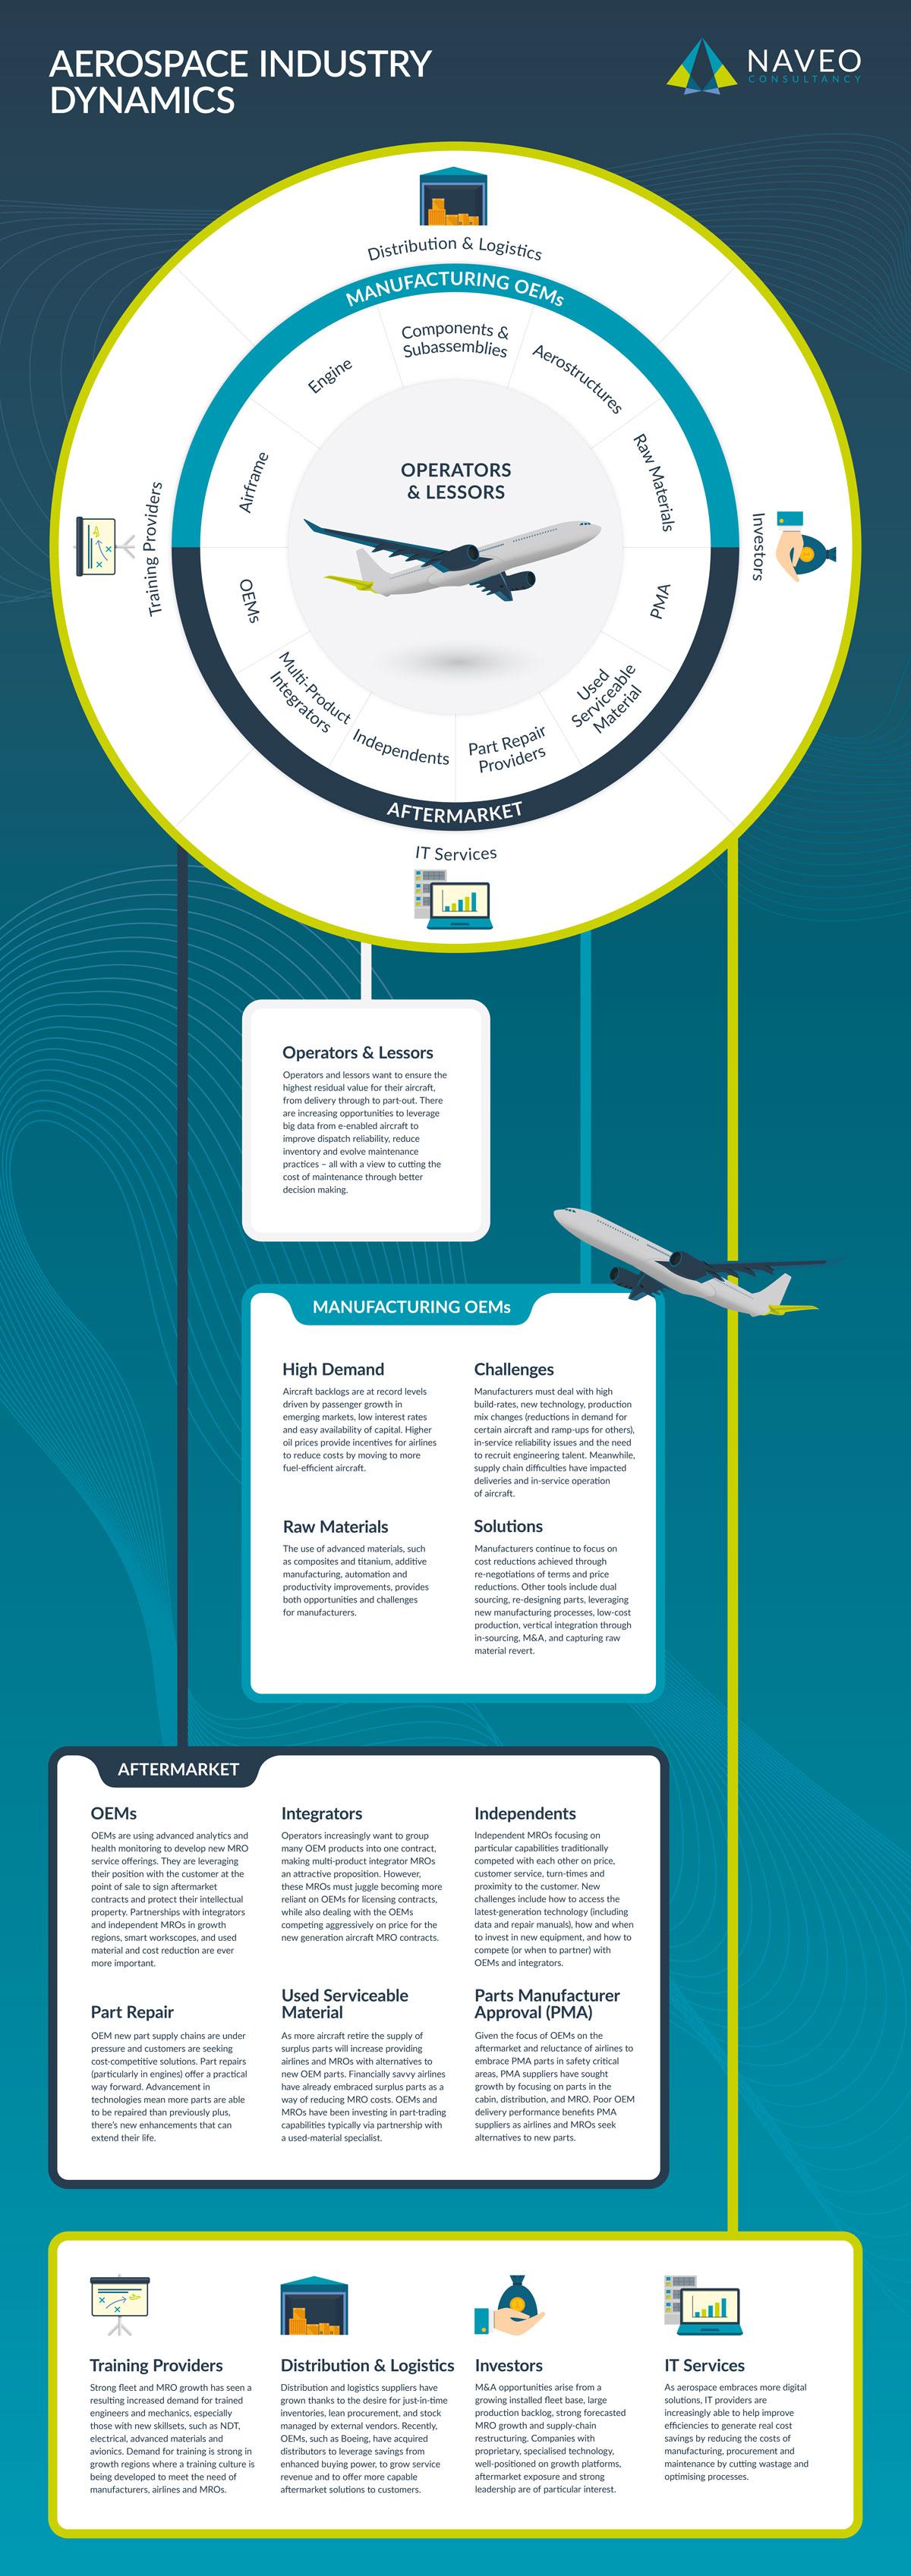 Aerospace Industry Dynamics